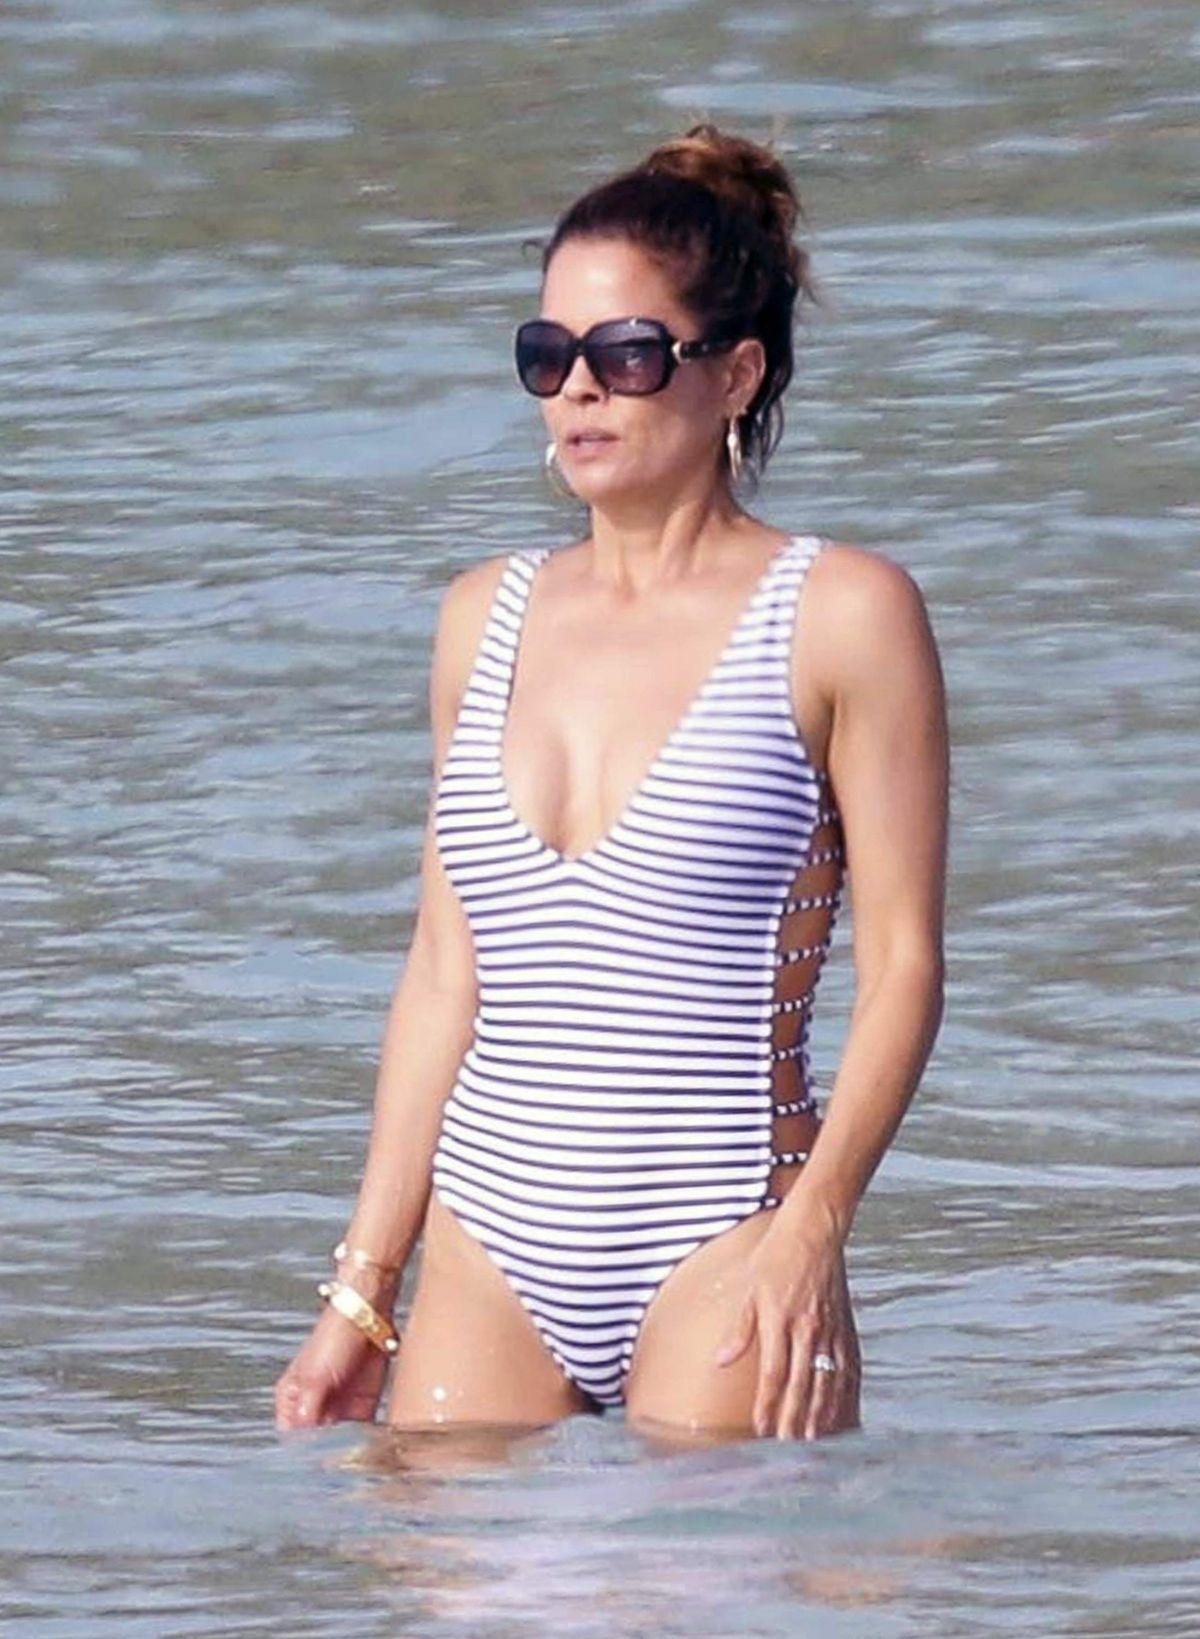 Bikini Juliette Binoche nude photos 2019